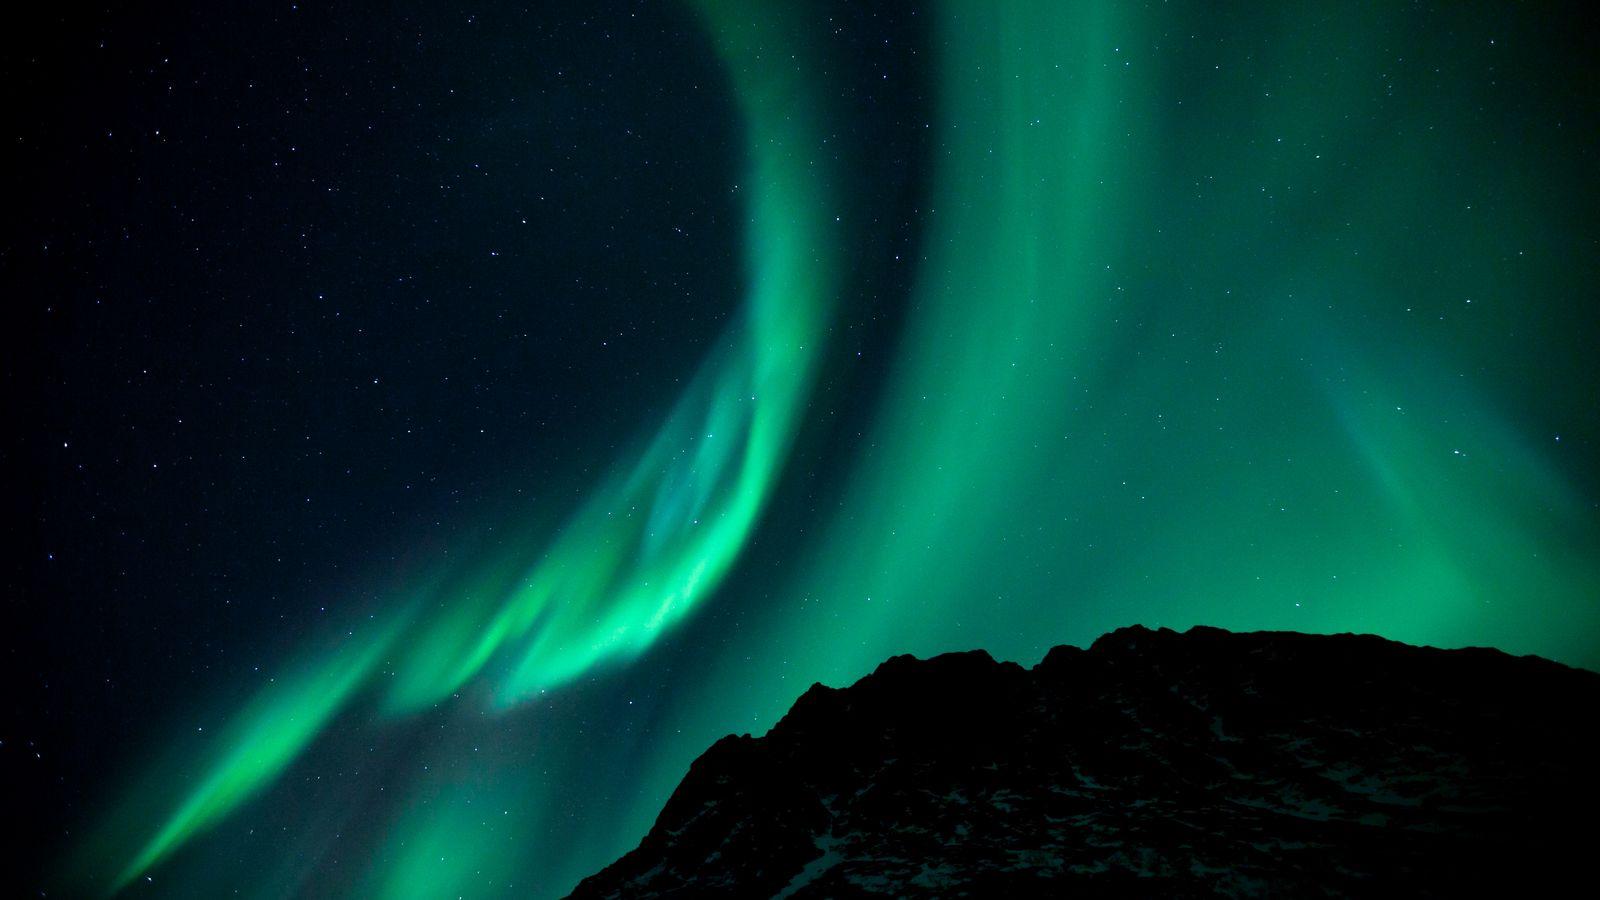 1600x900 Wallpaper northern lights, night, night sky, phenomenon